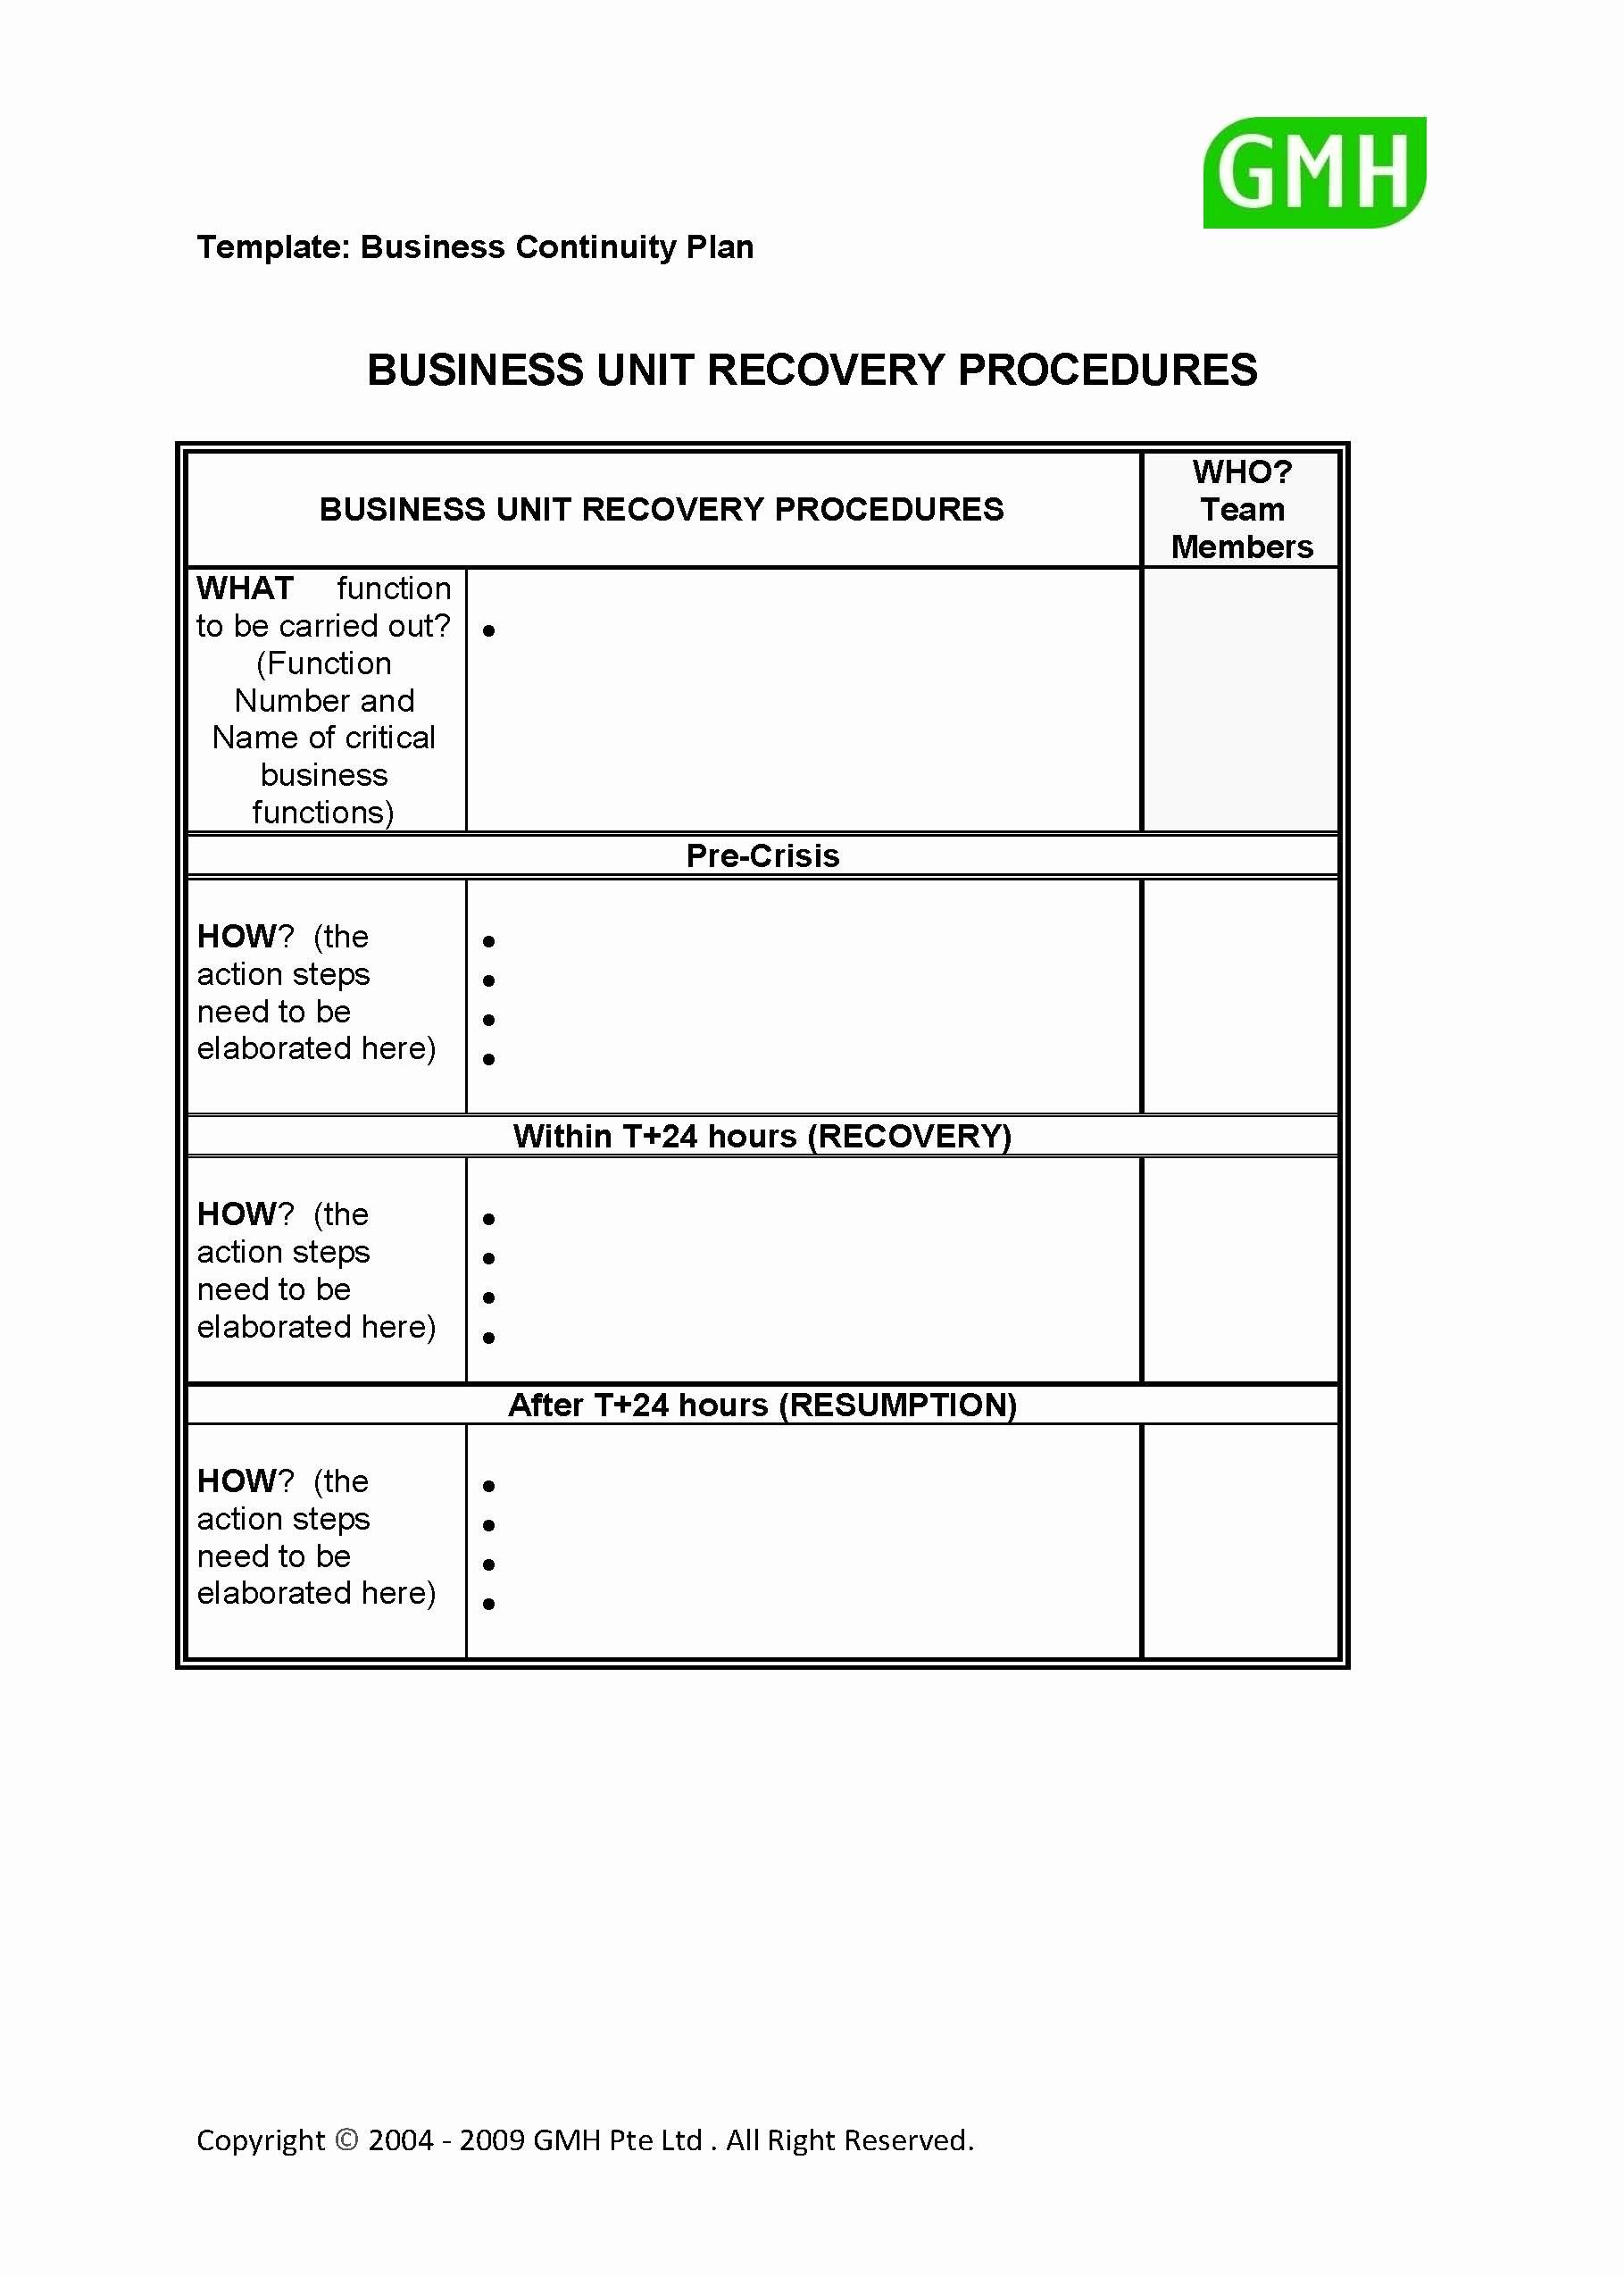 Customer Service Business Plan Template – Guiaubuntupt Pertaining To Customer Service Business Plan Template